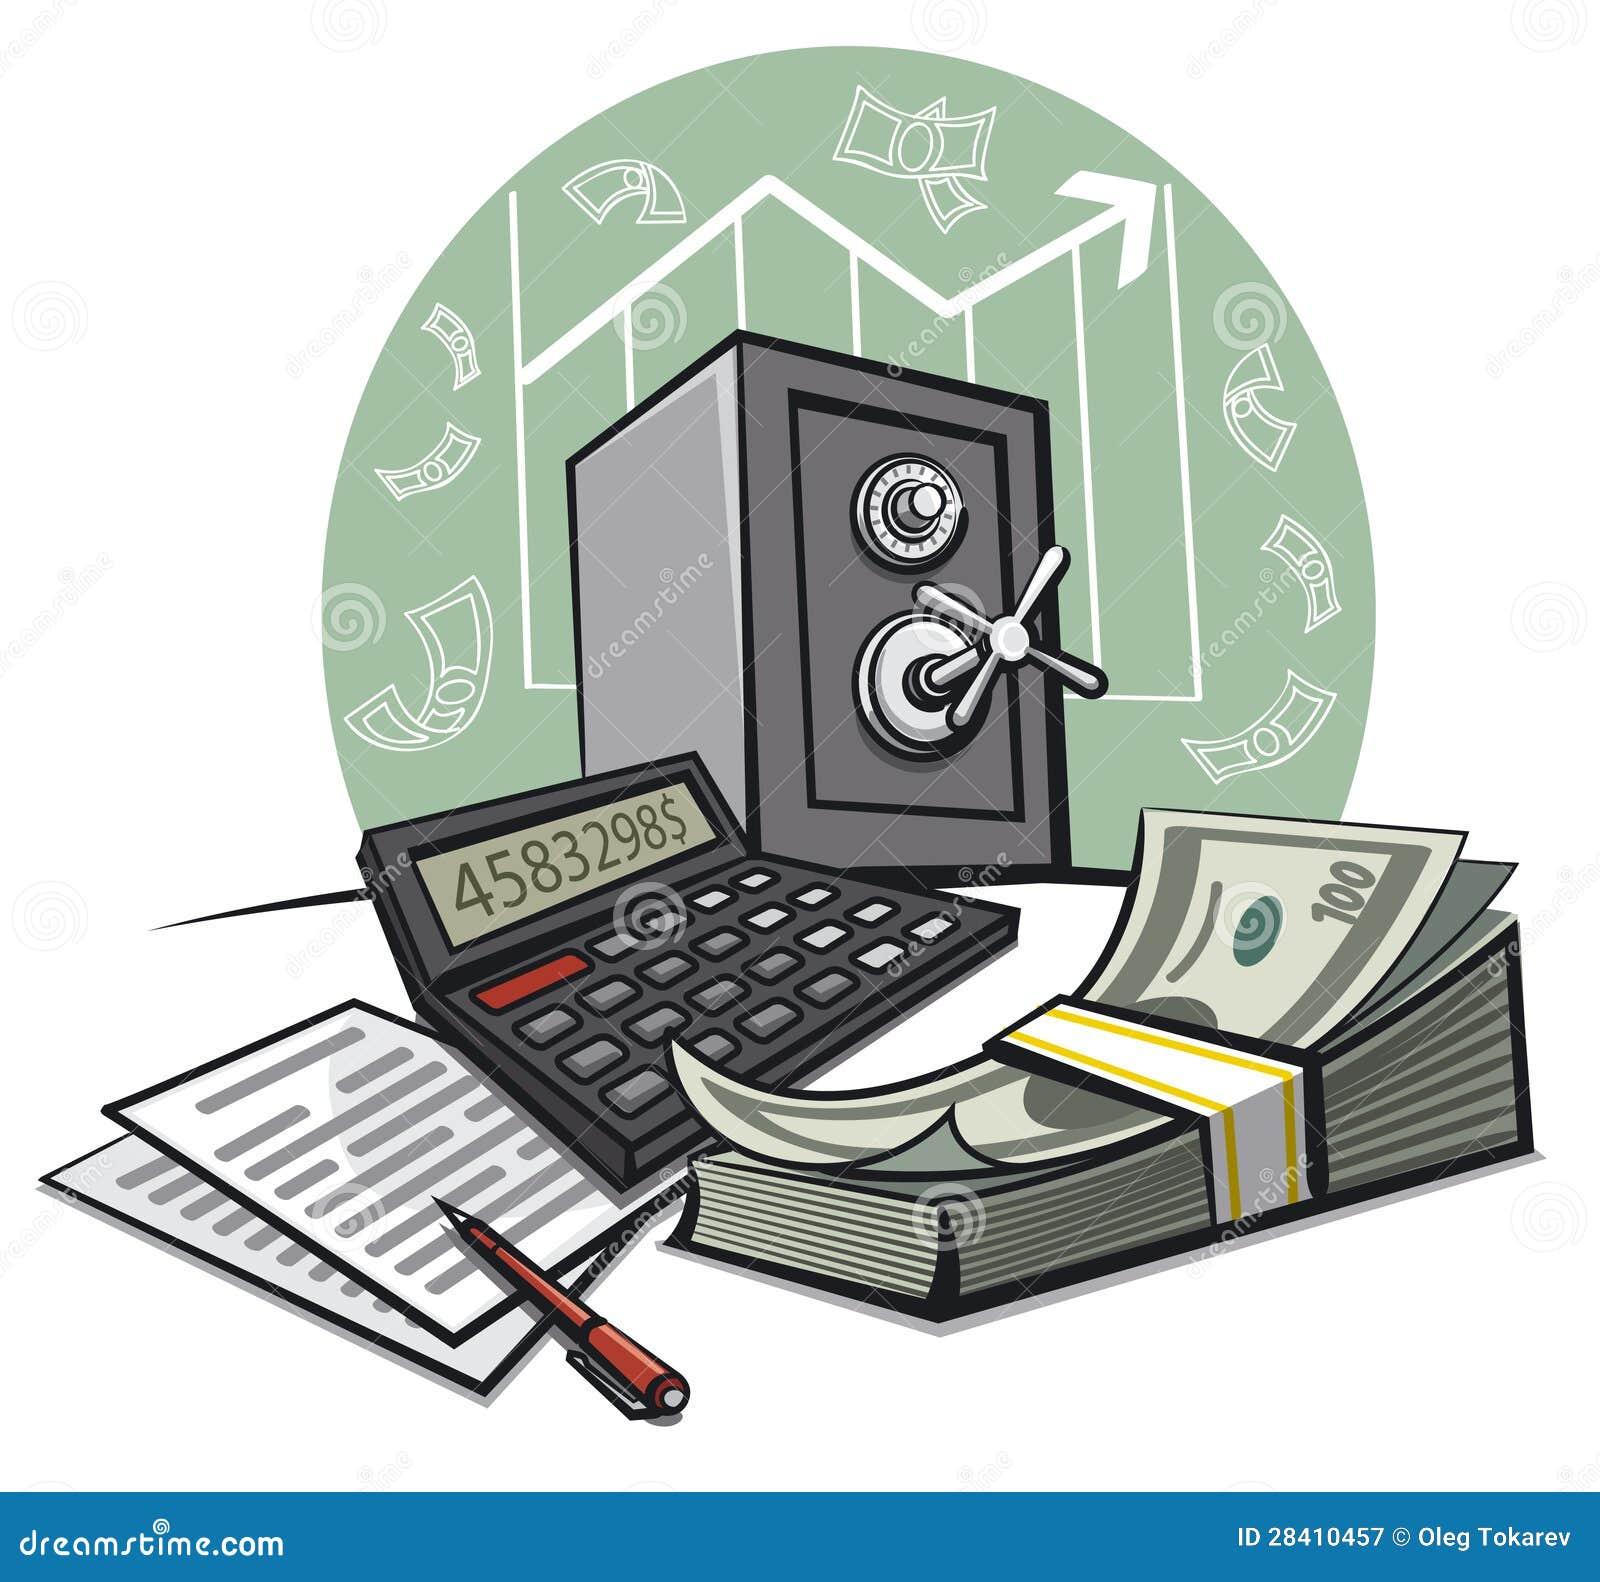 ACCT - Accounting (ACCT)